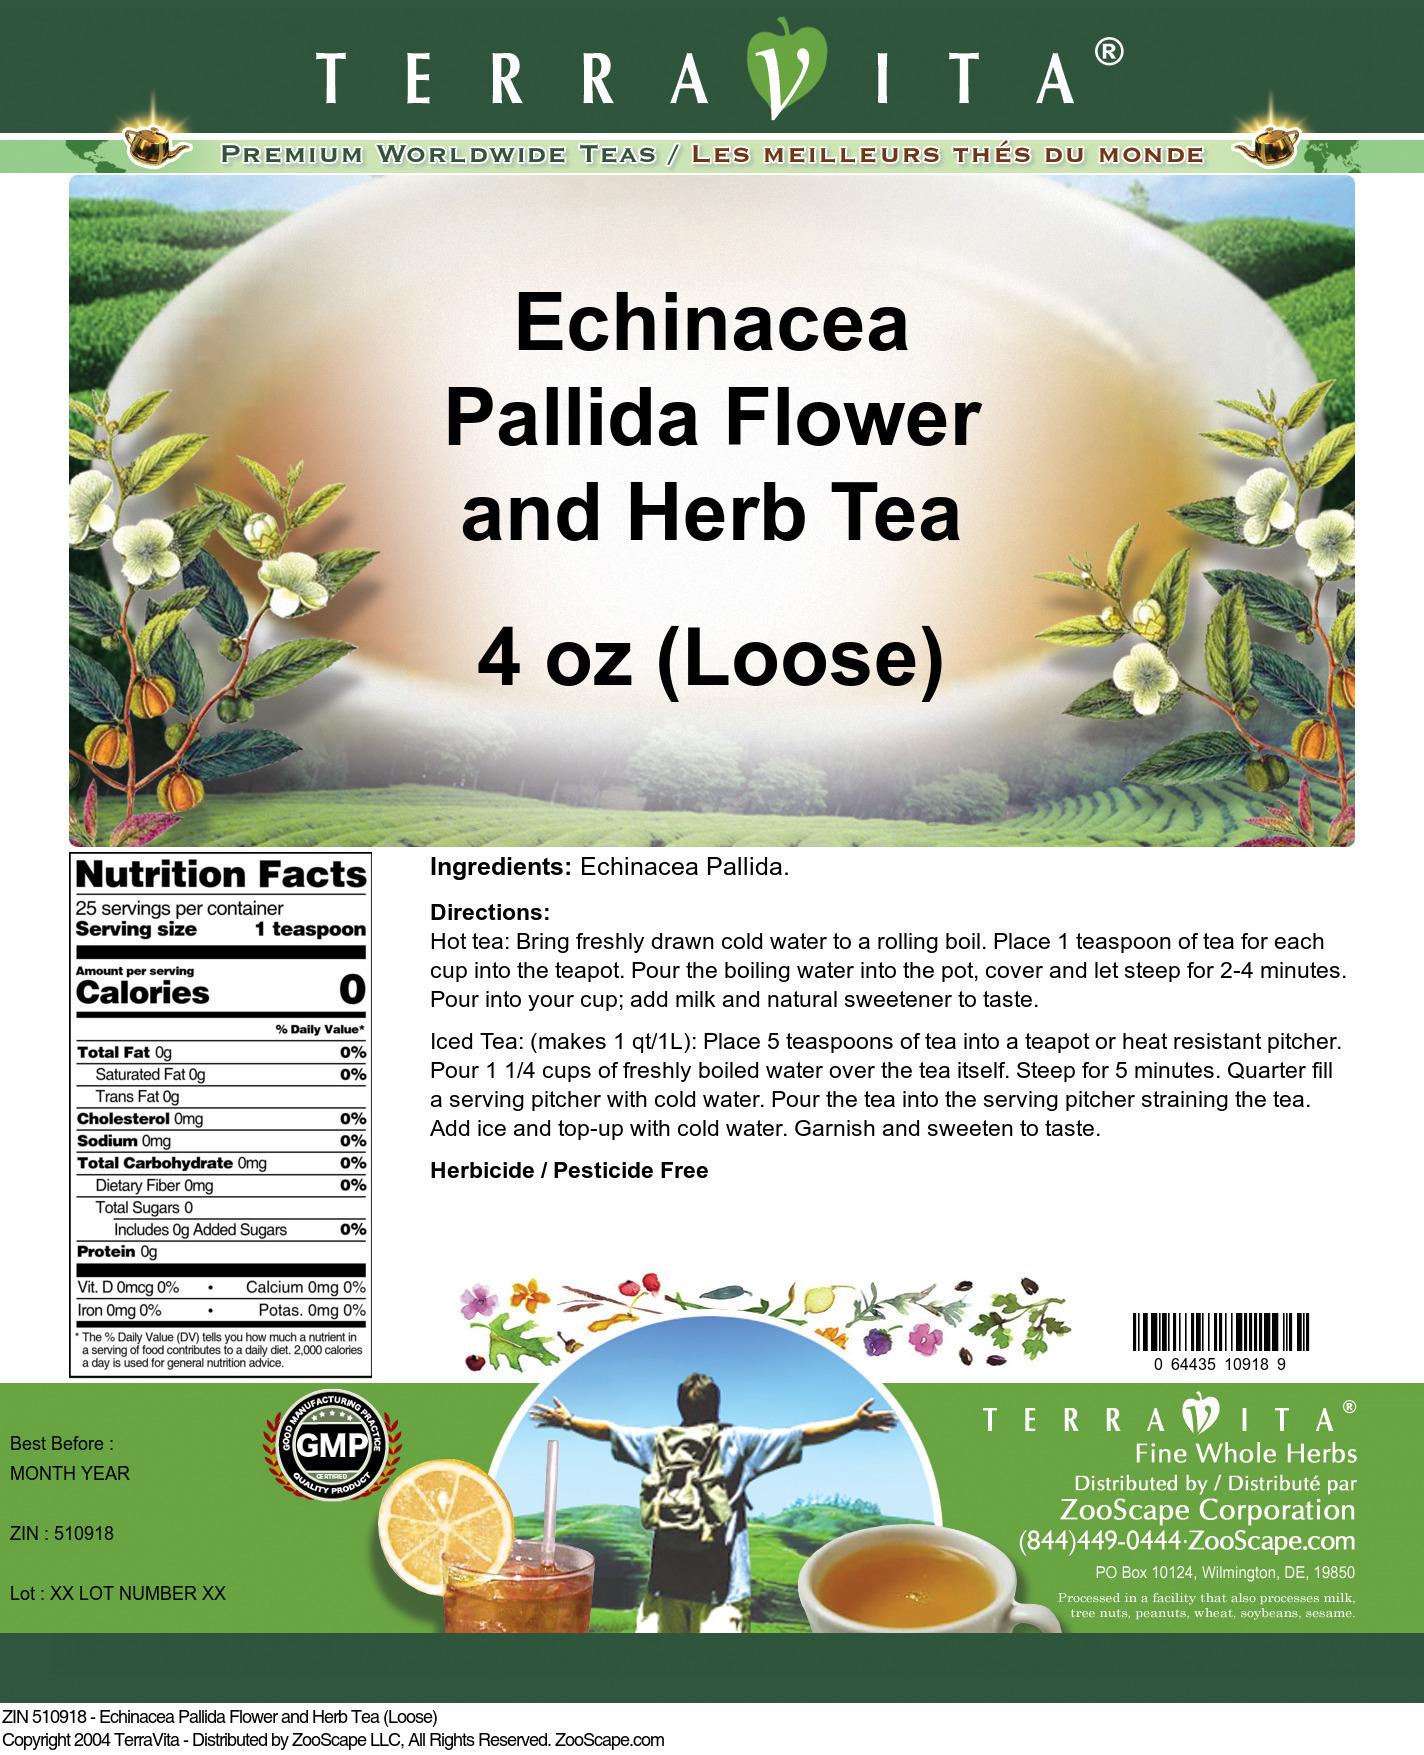 Echinacea Pallida Flower and Herb Tea (Loose)